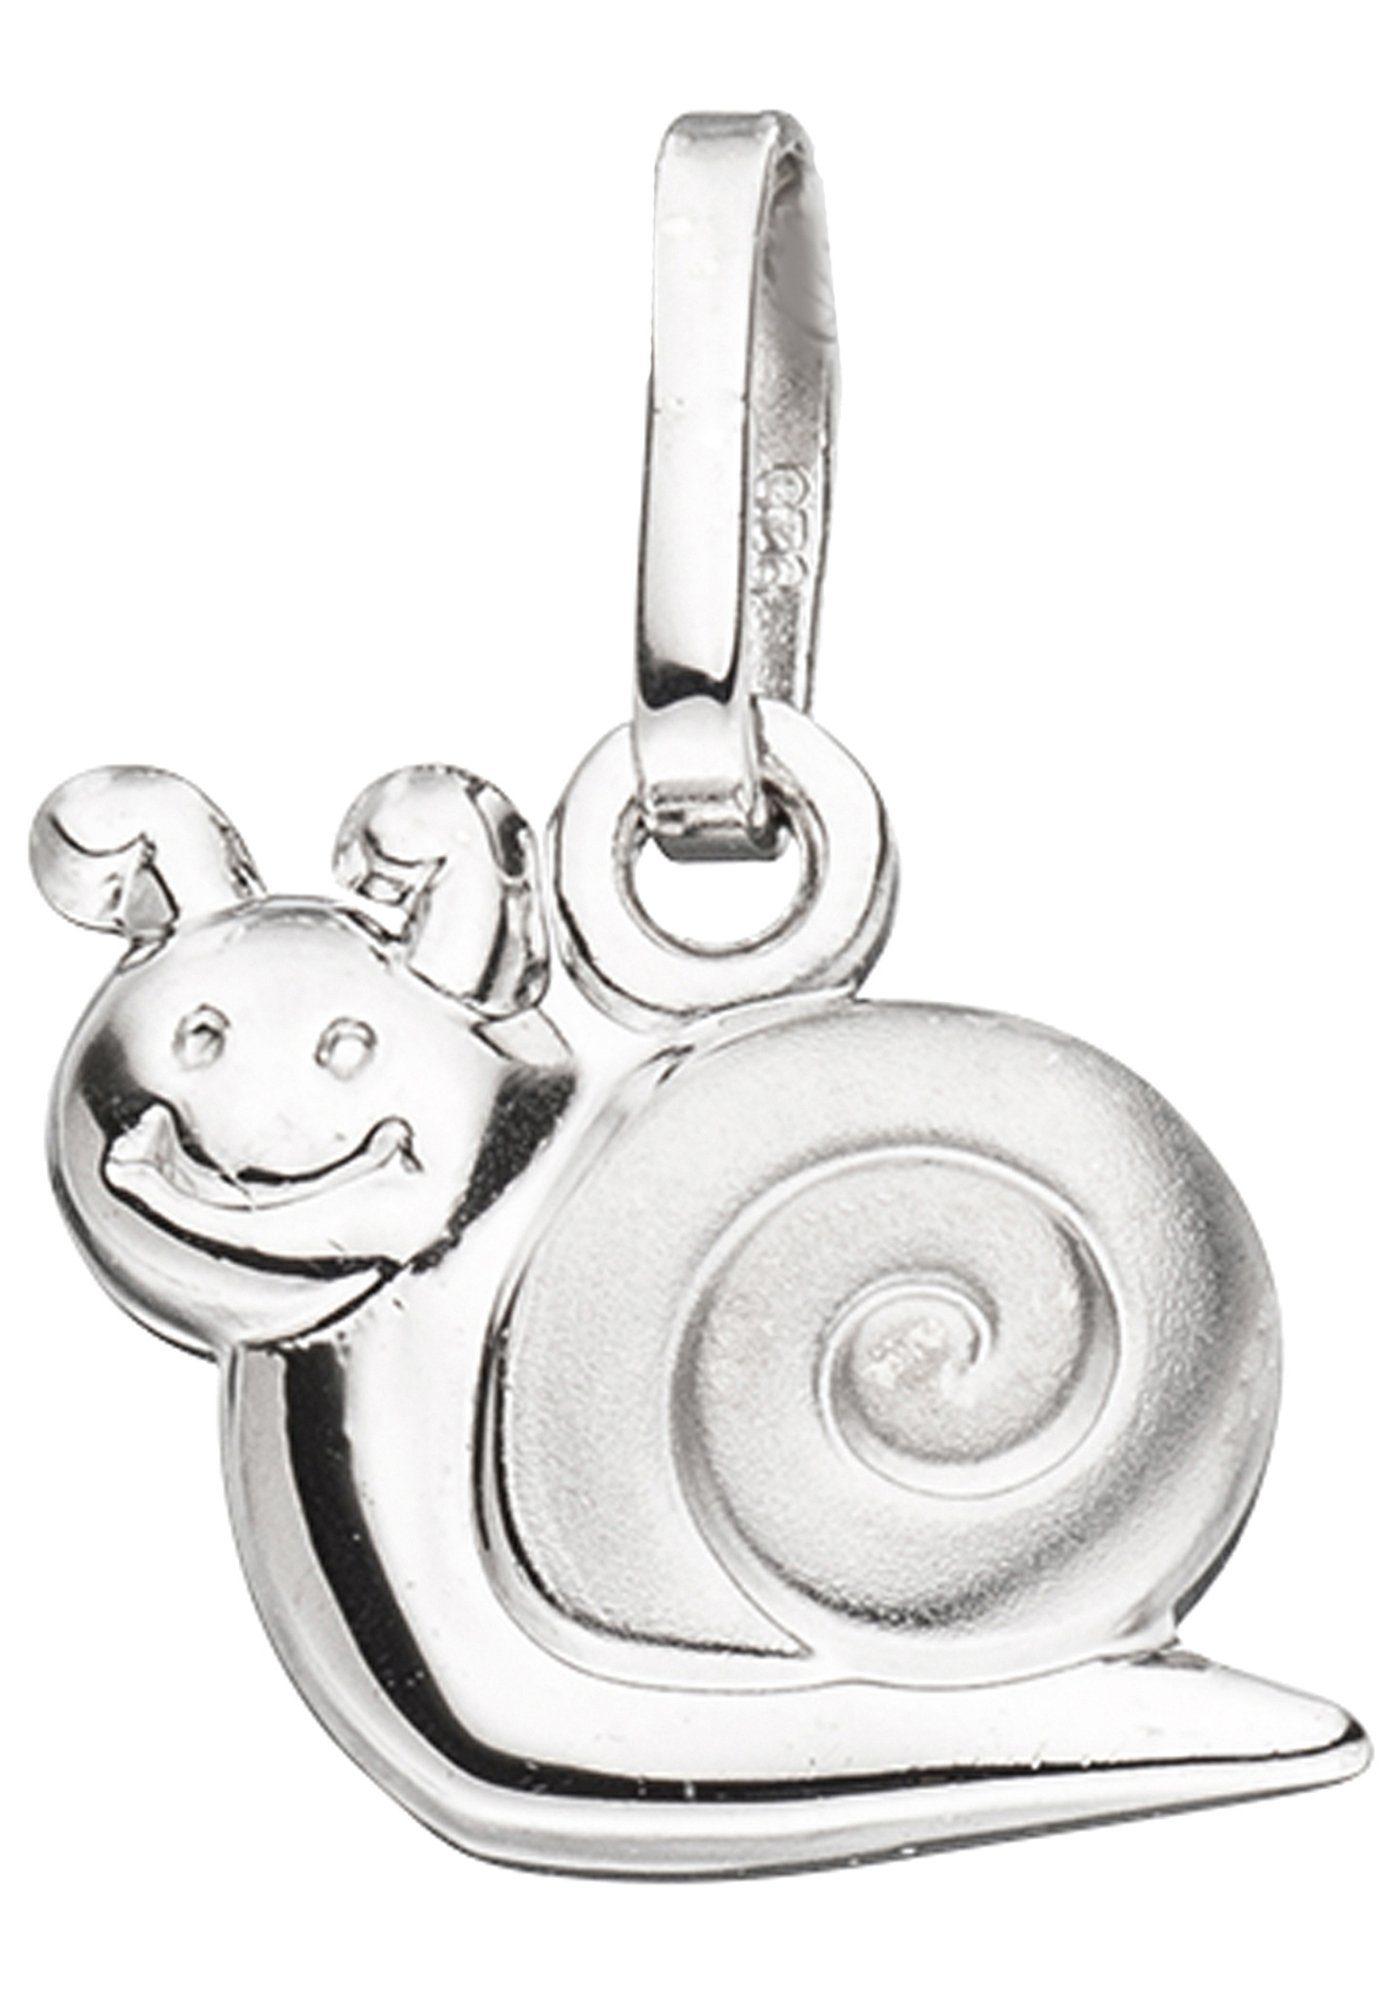 JOBO Kettenanhänger »Schnecke« 925 Silber